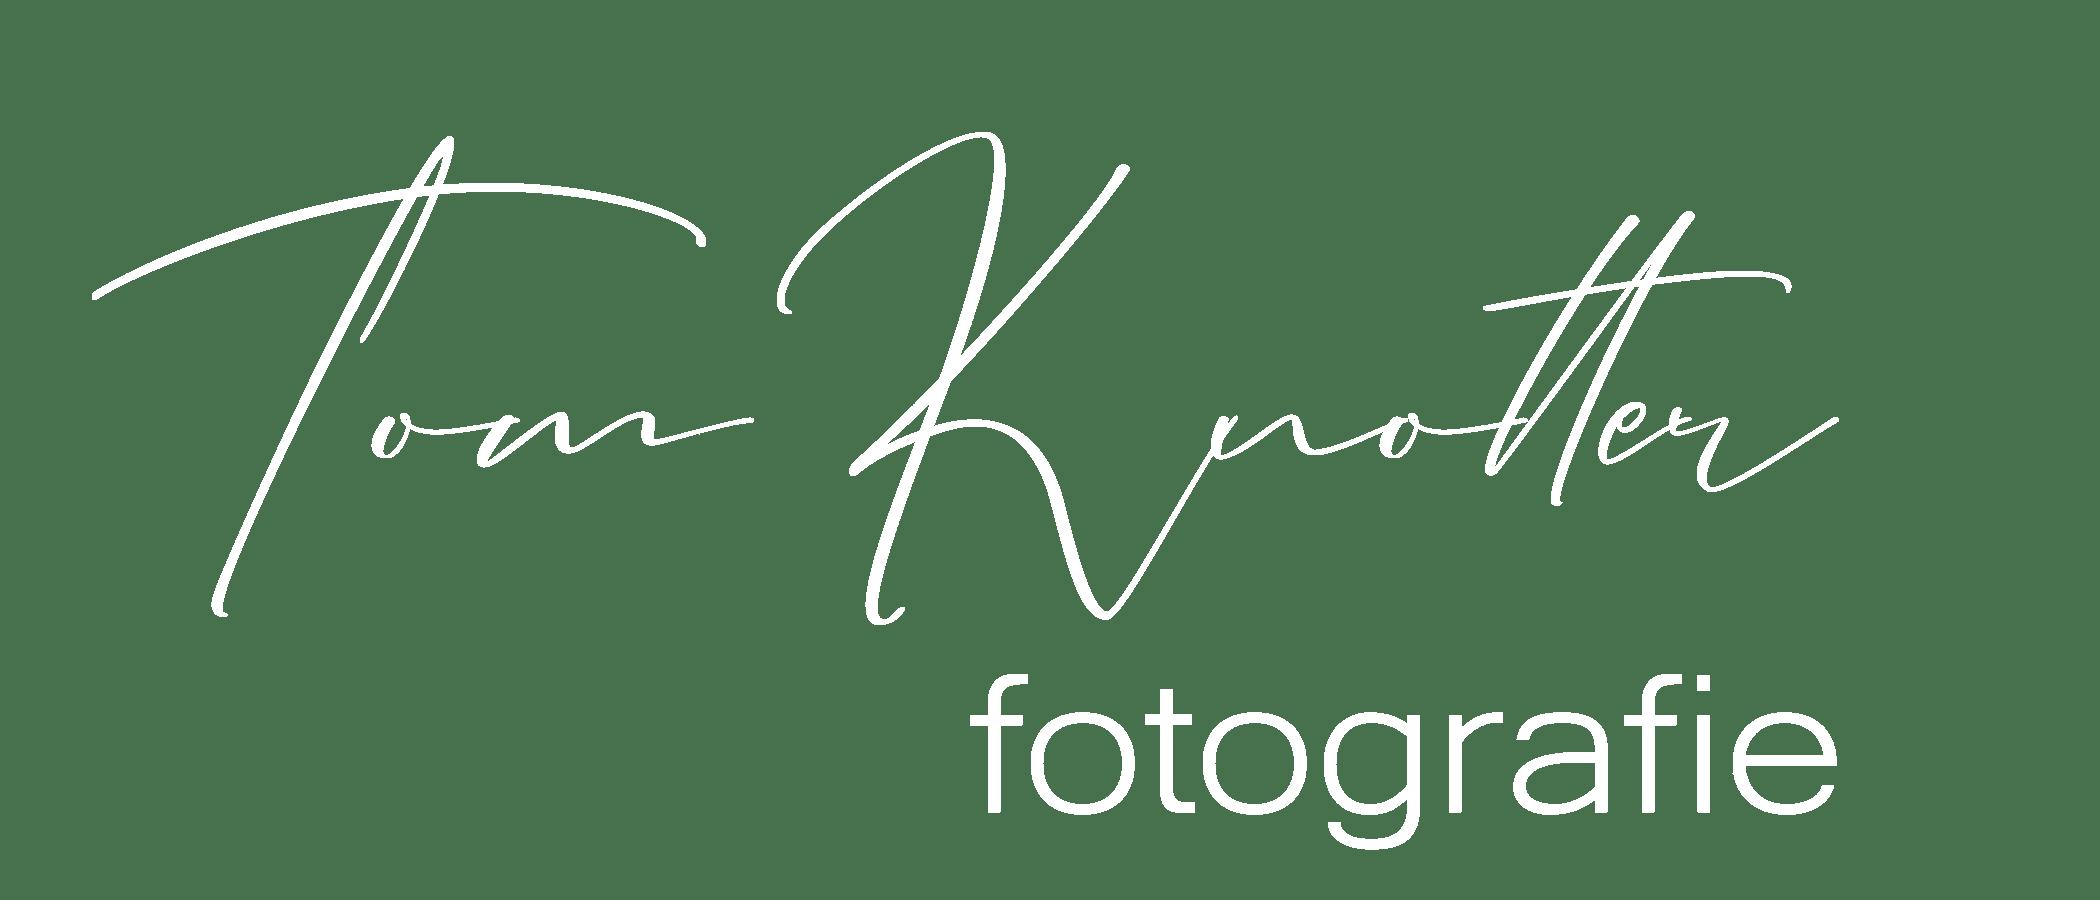 Tom Knotter Fotografie